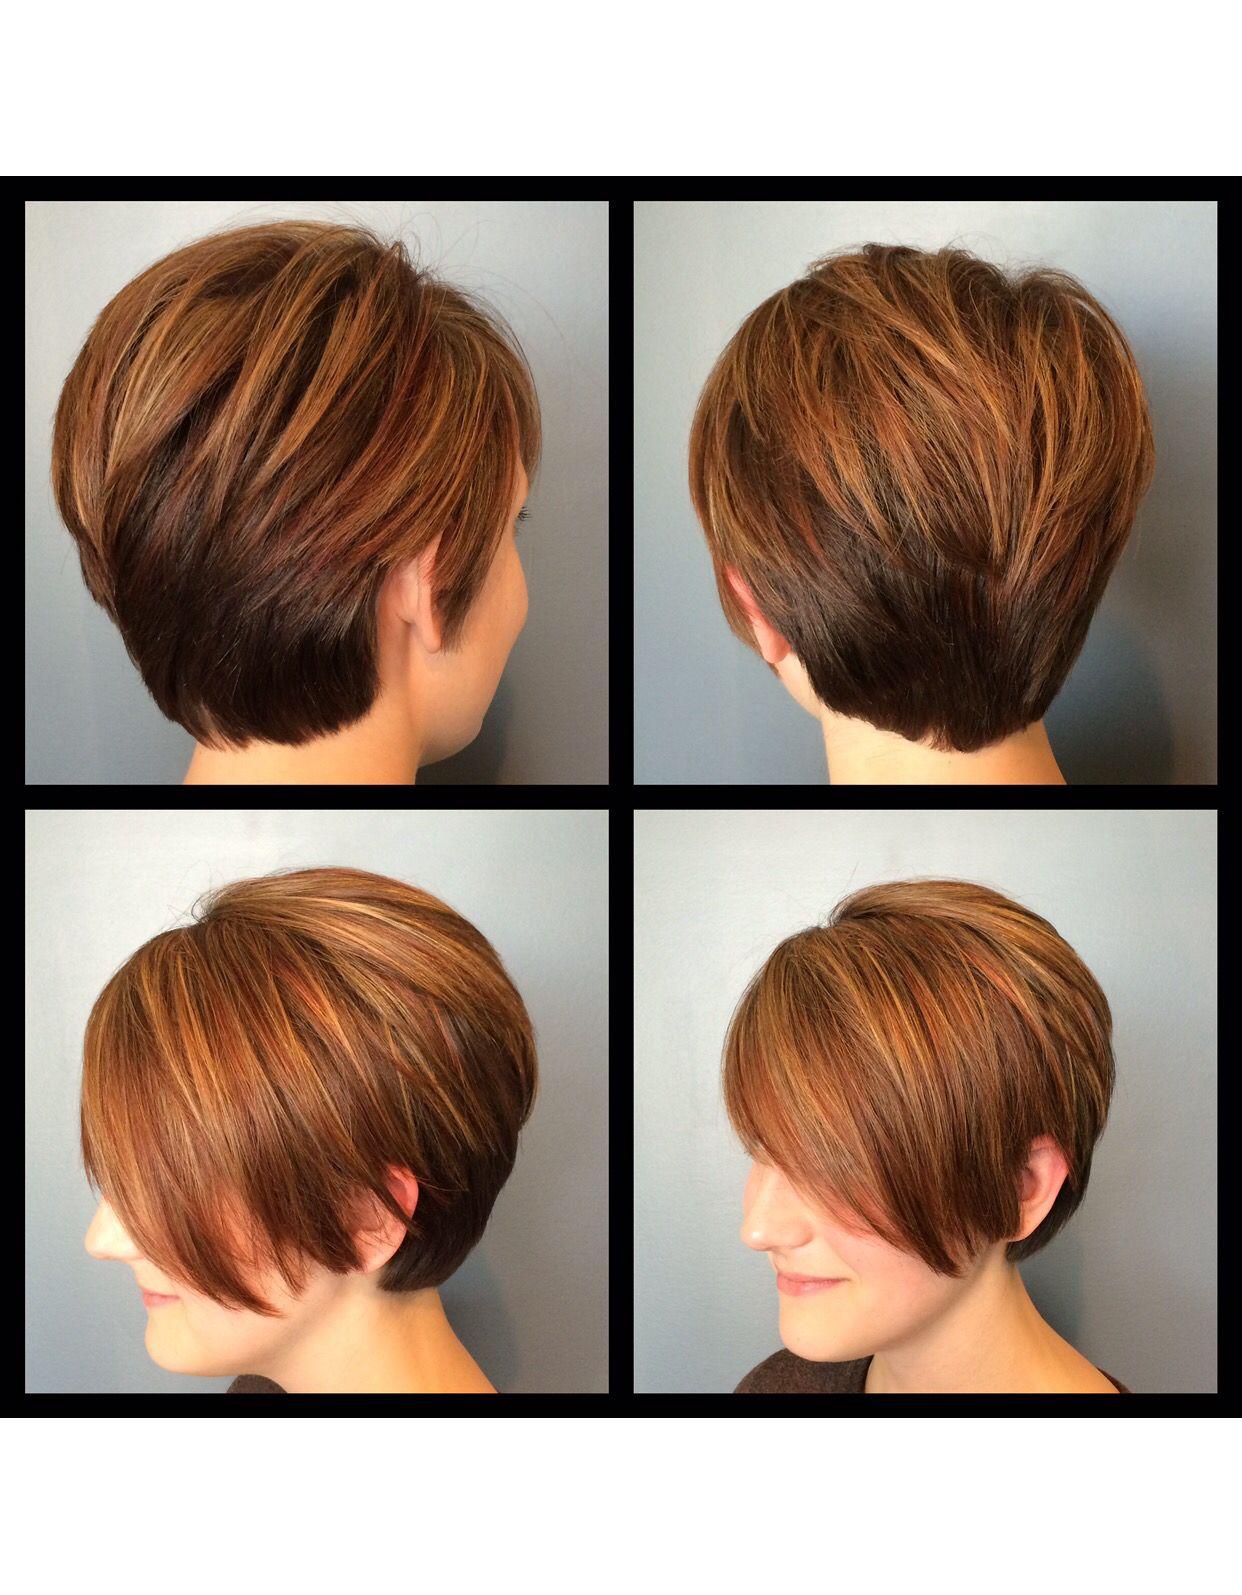 Short hair cut by Leila  Evoke Gallery  Pinterest  Shorter hair